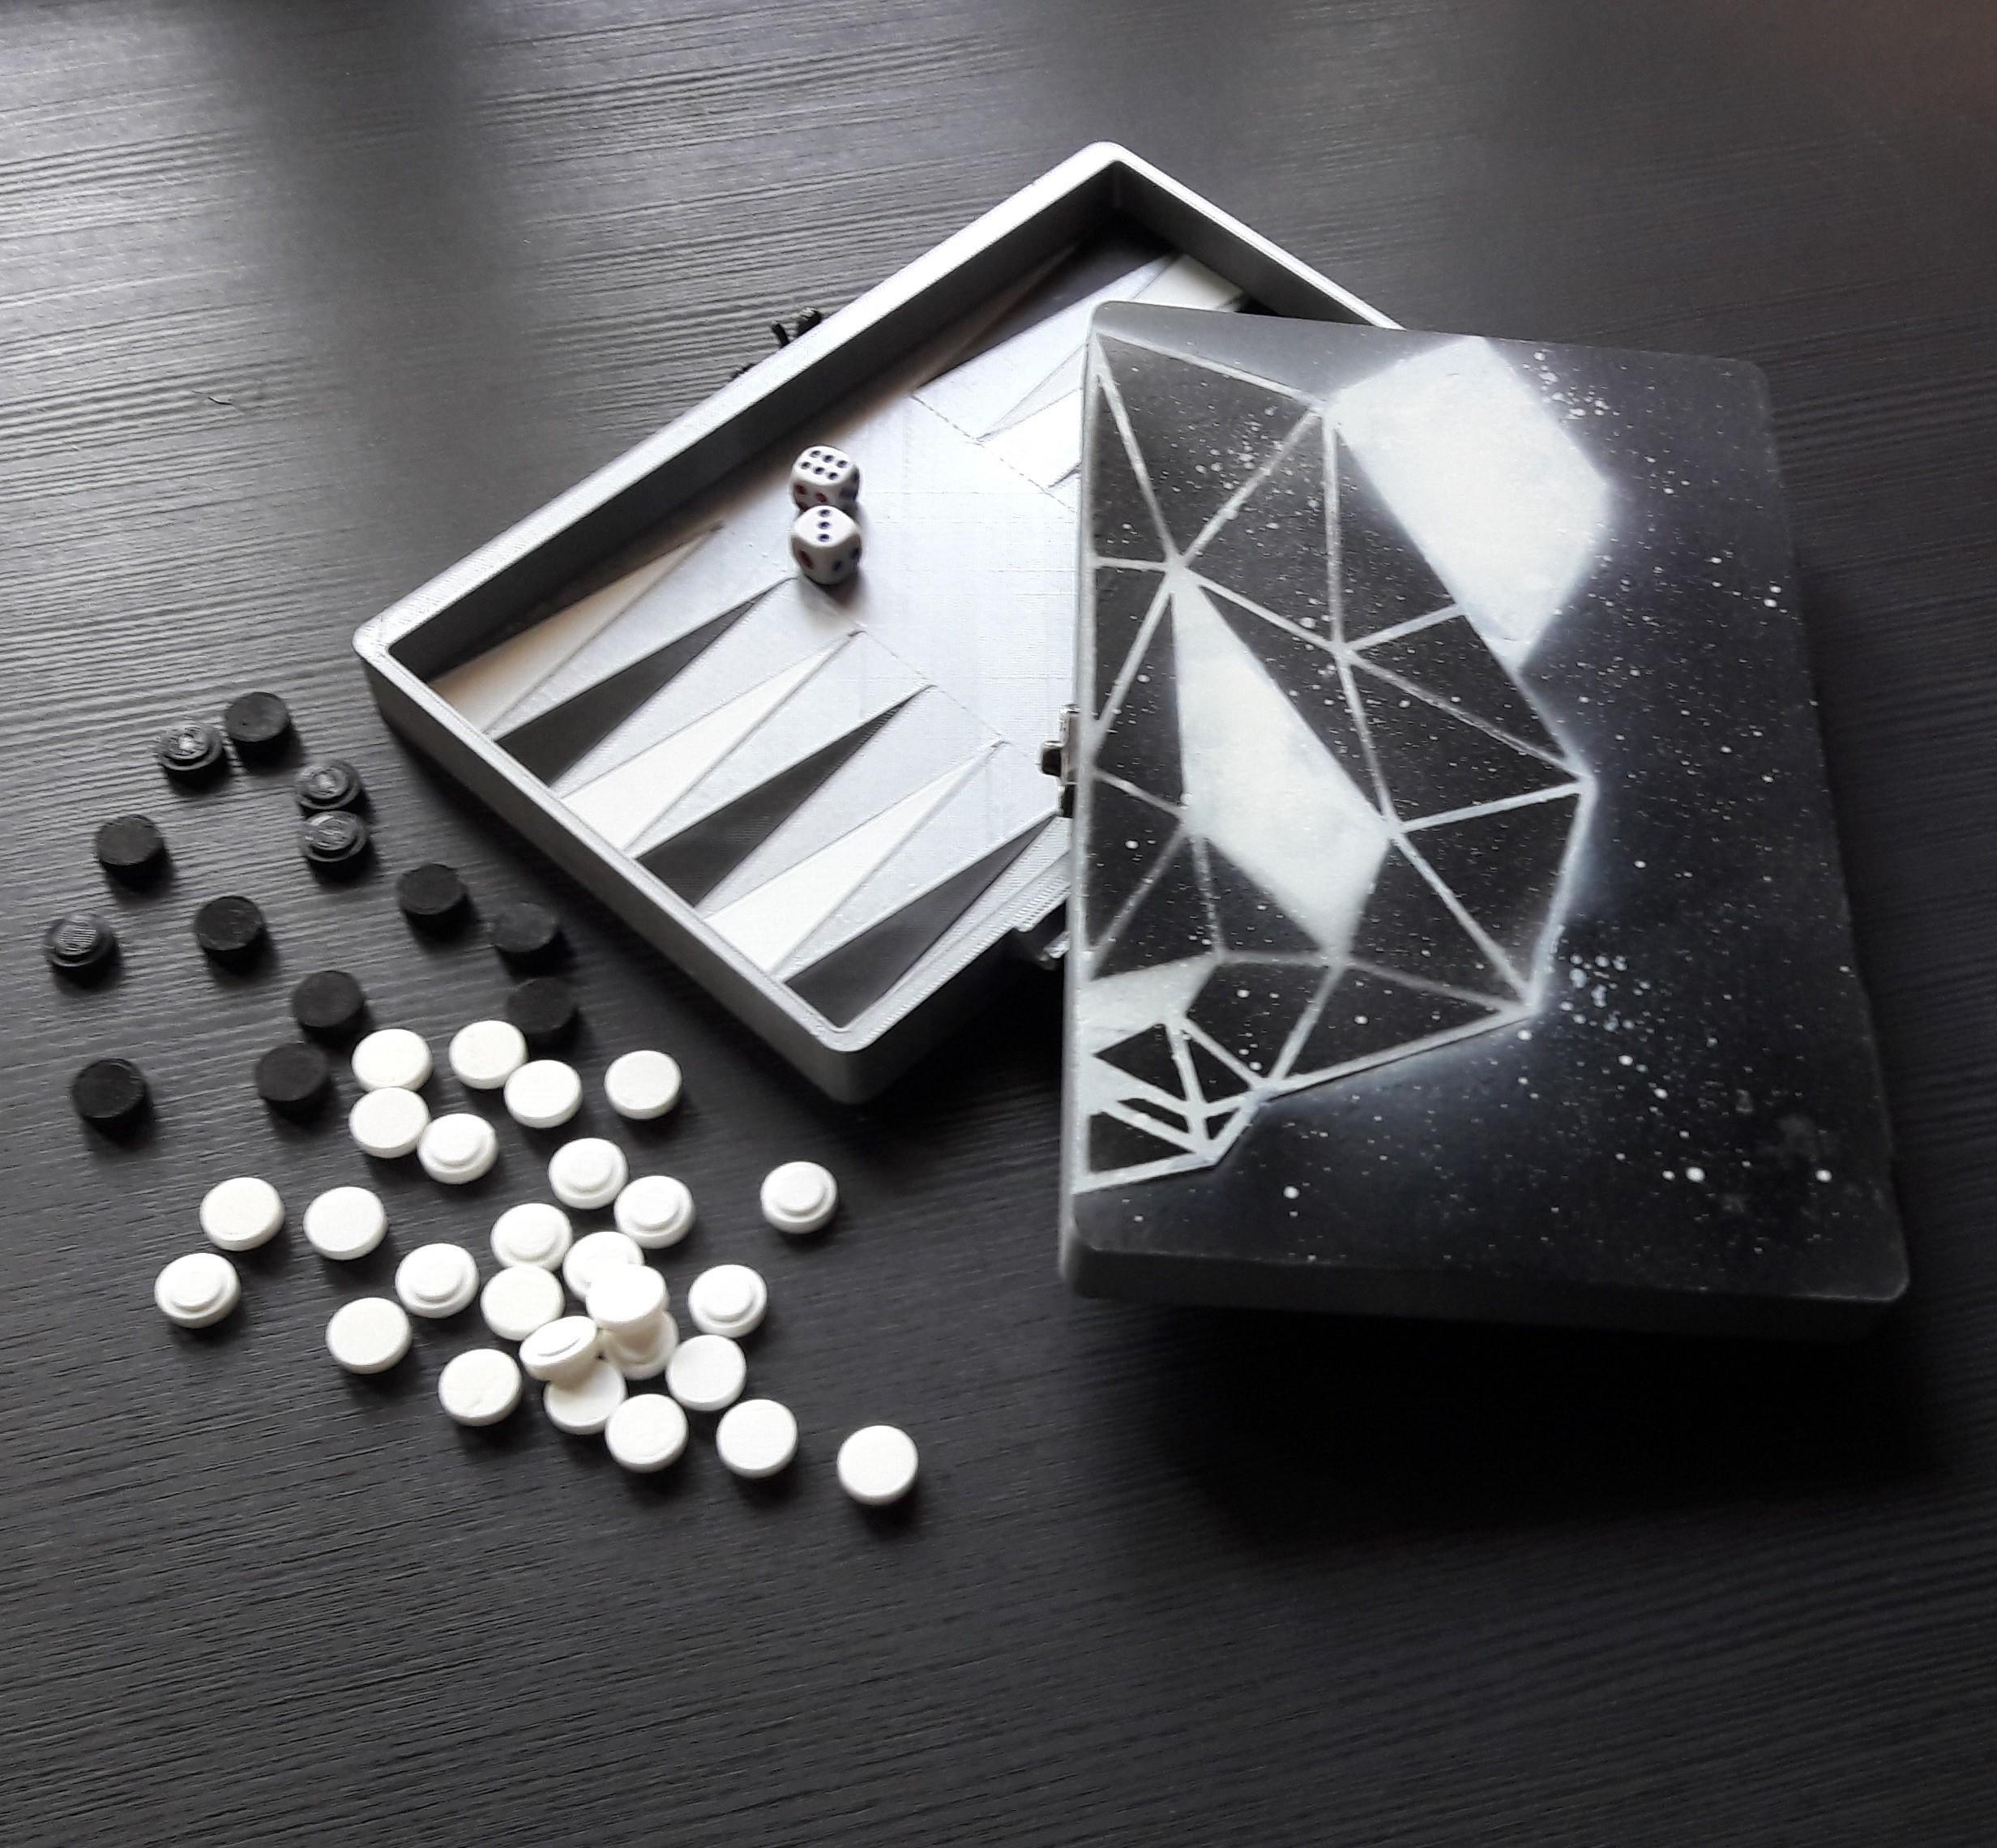 20170907_081752.jpg Download STL file Backgammon game • 3D print template, eliza_sparrow